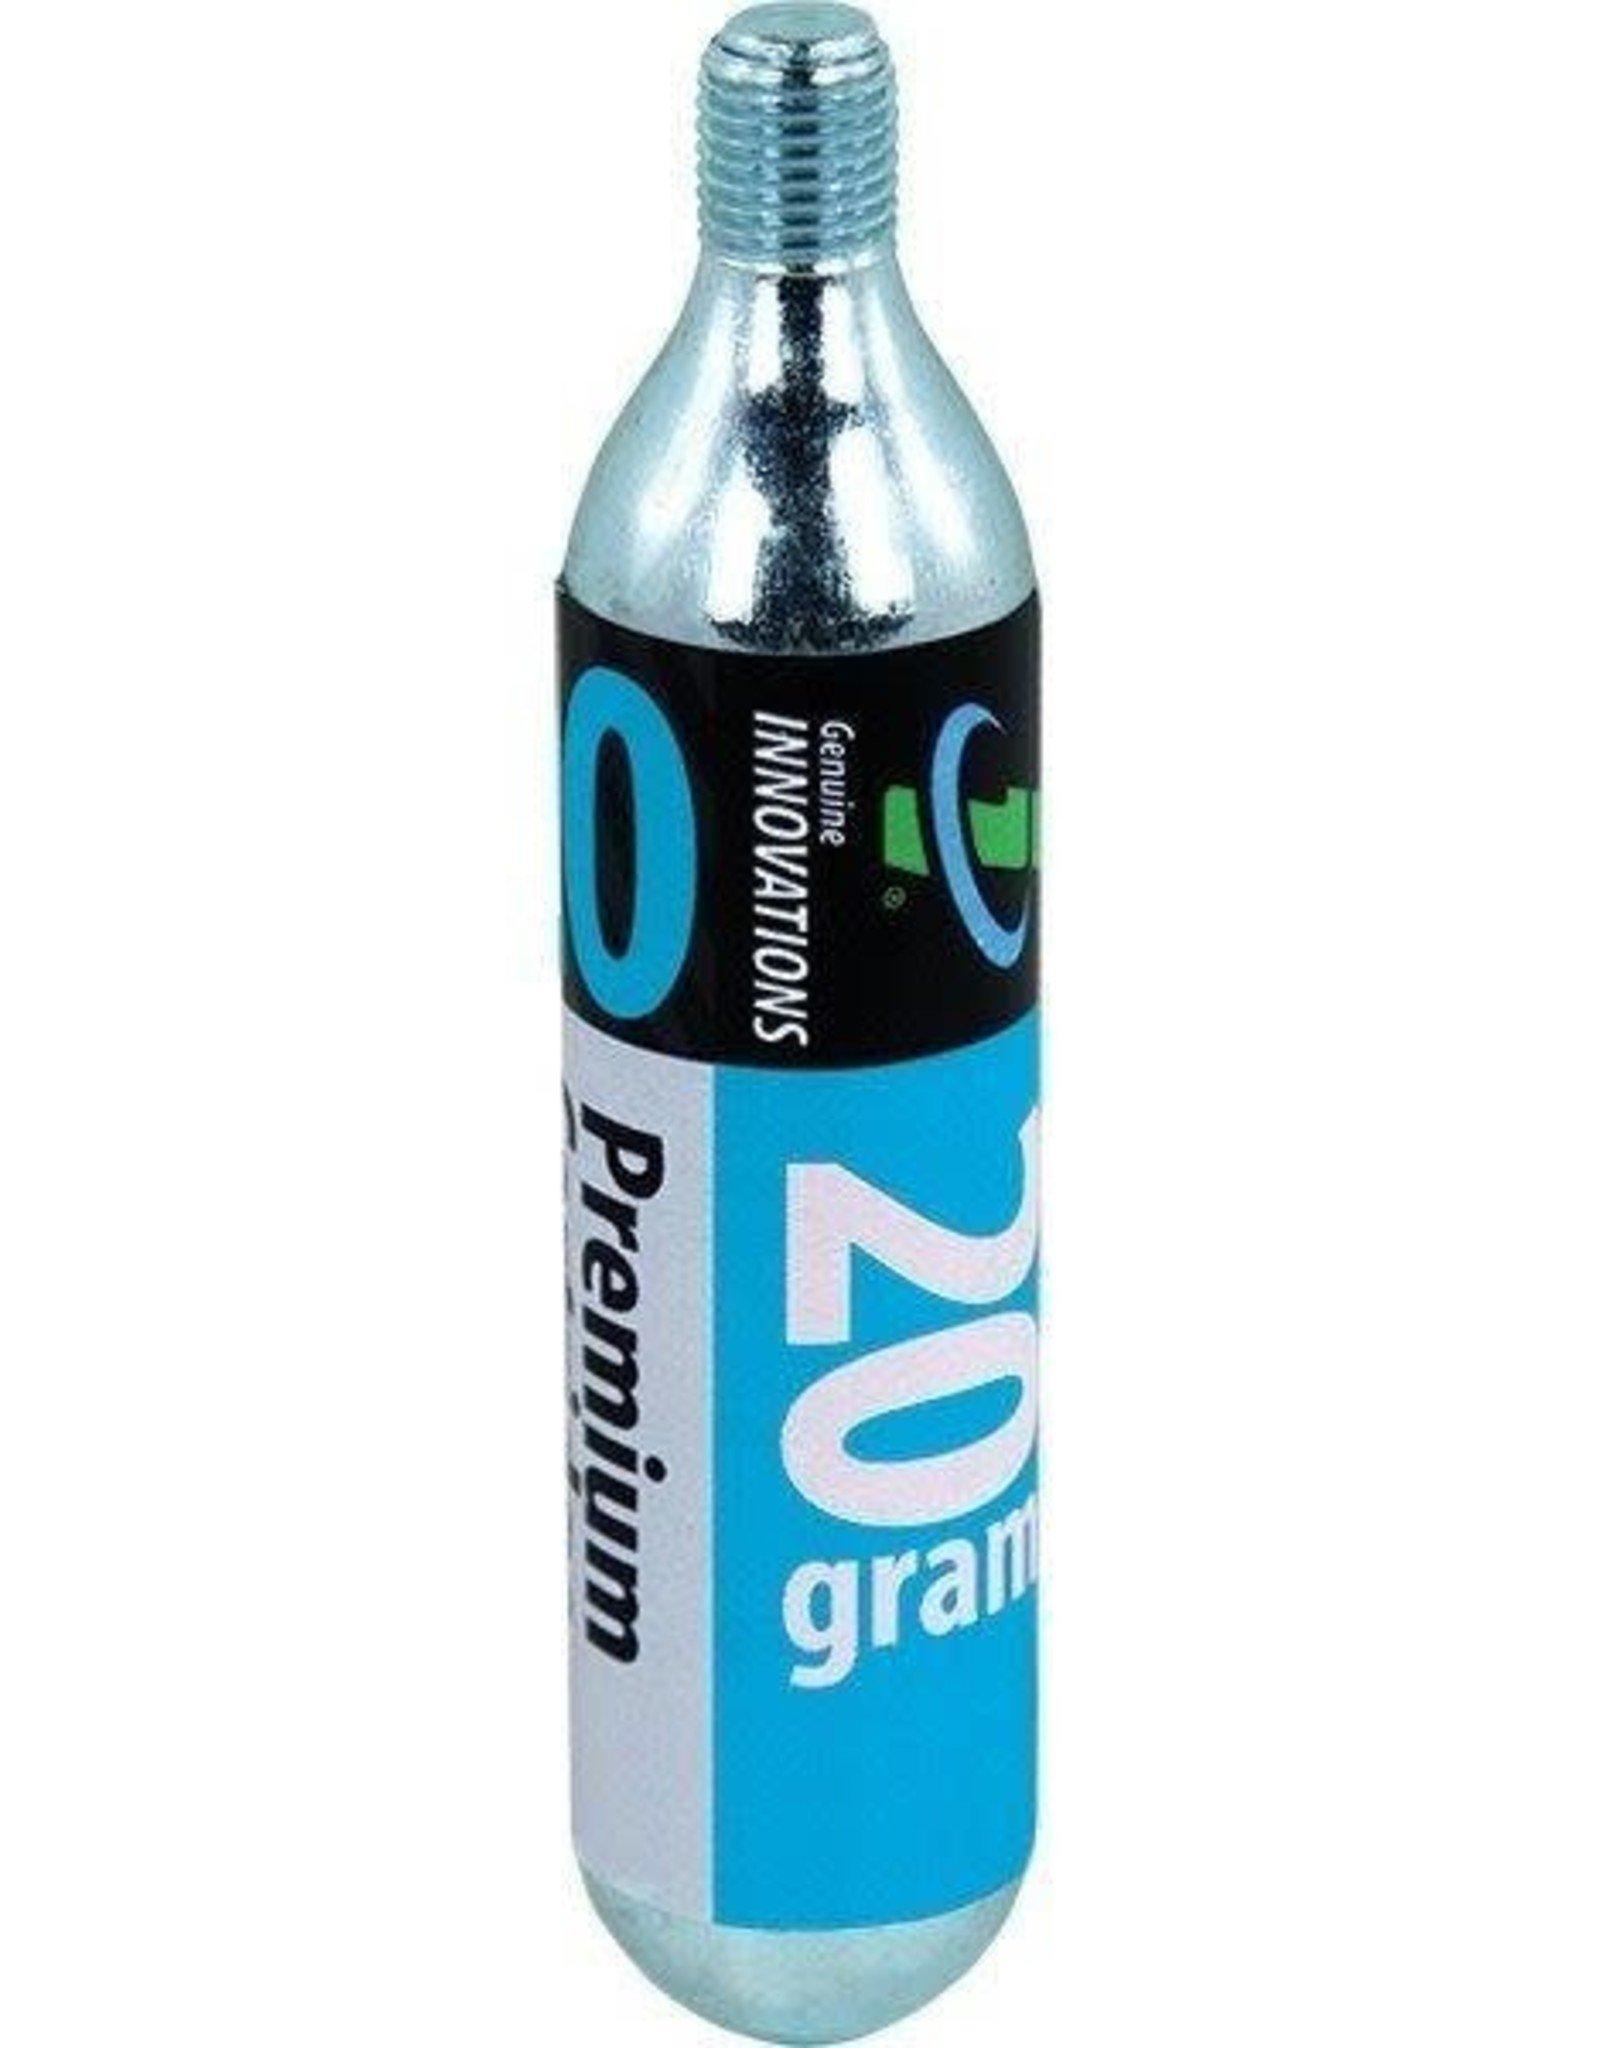 Genuine Innovations 20g Threaded CO2 Cartridge